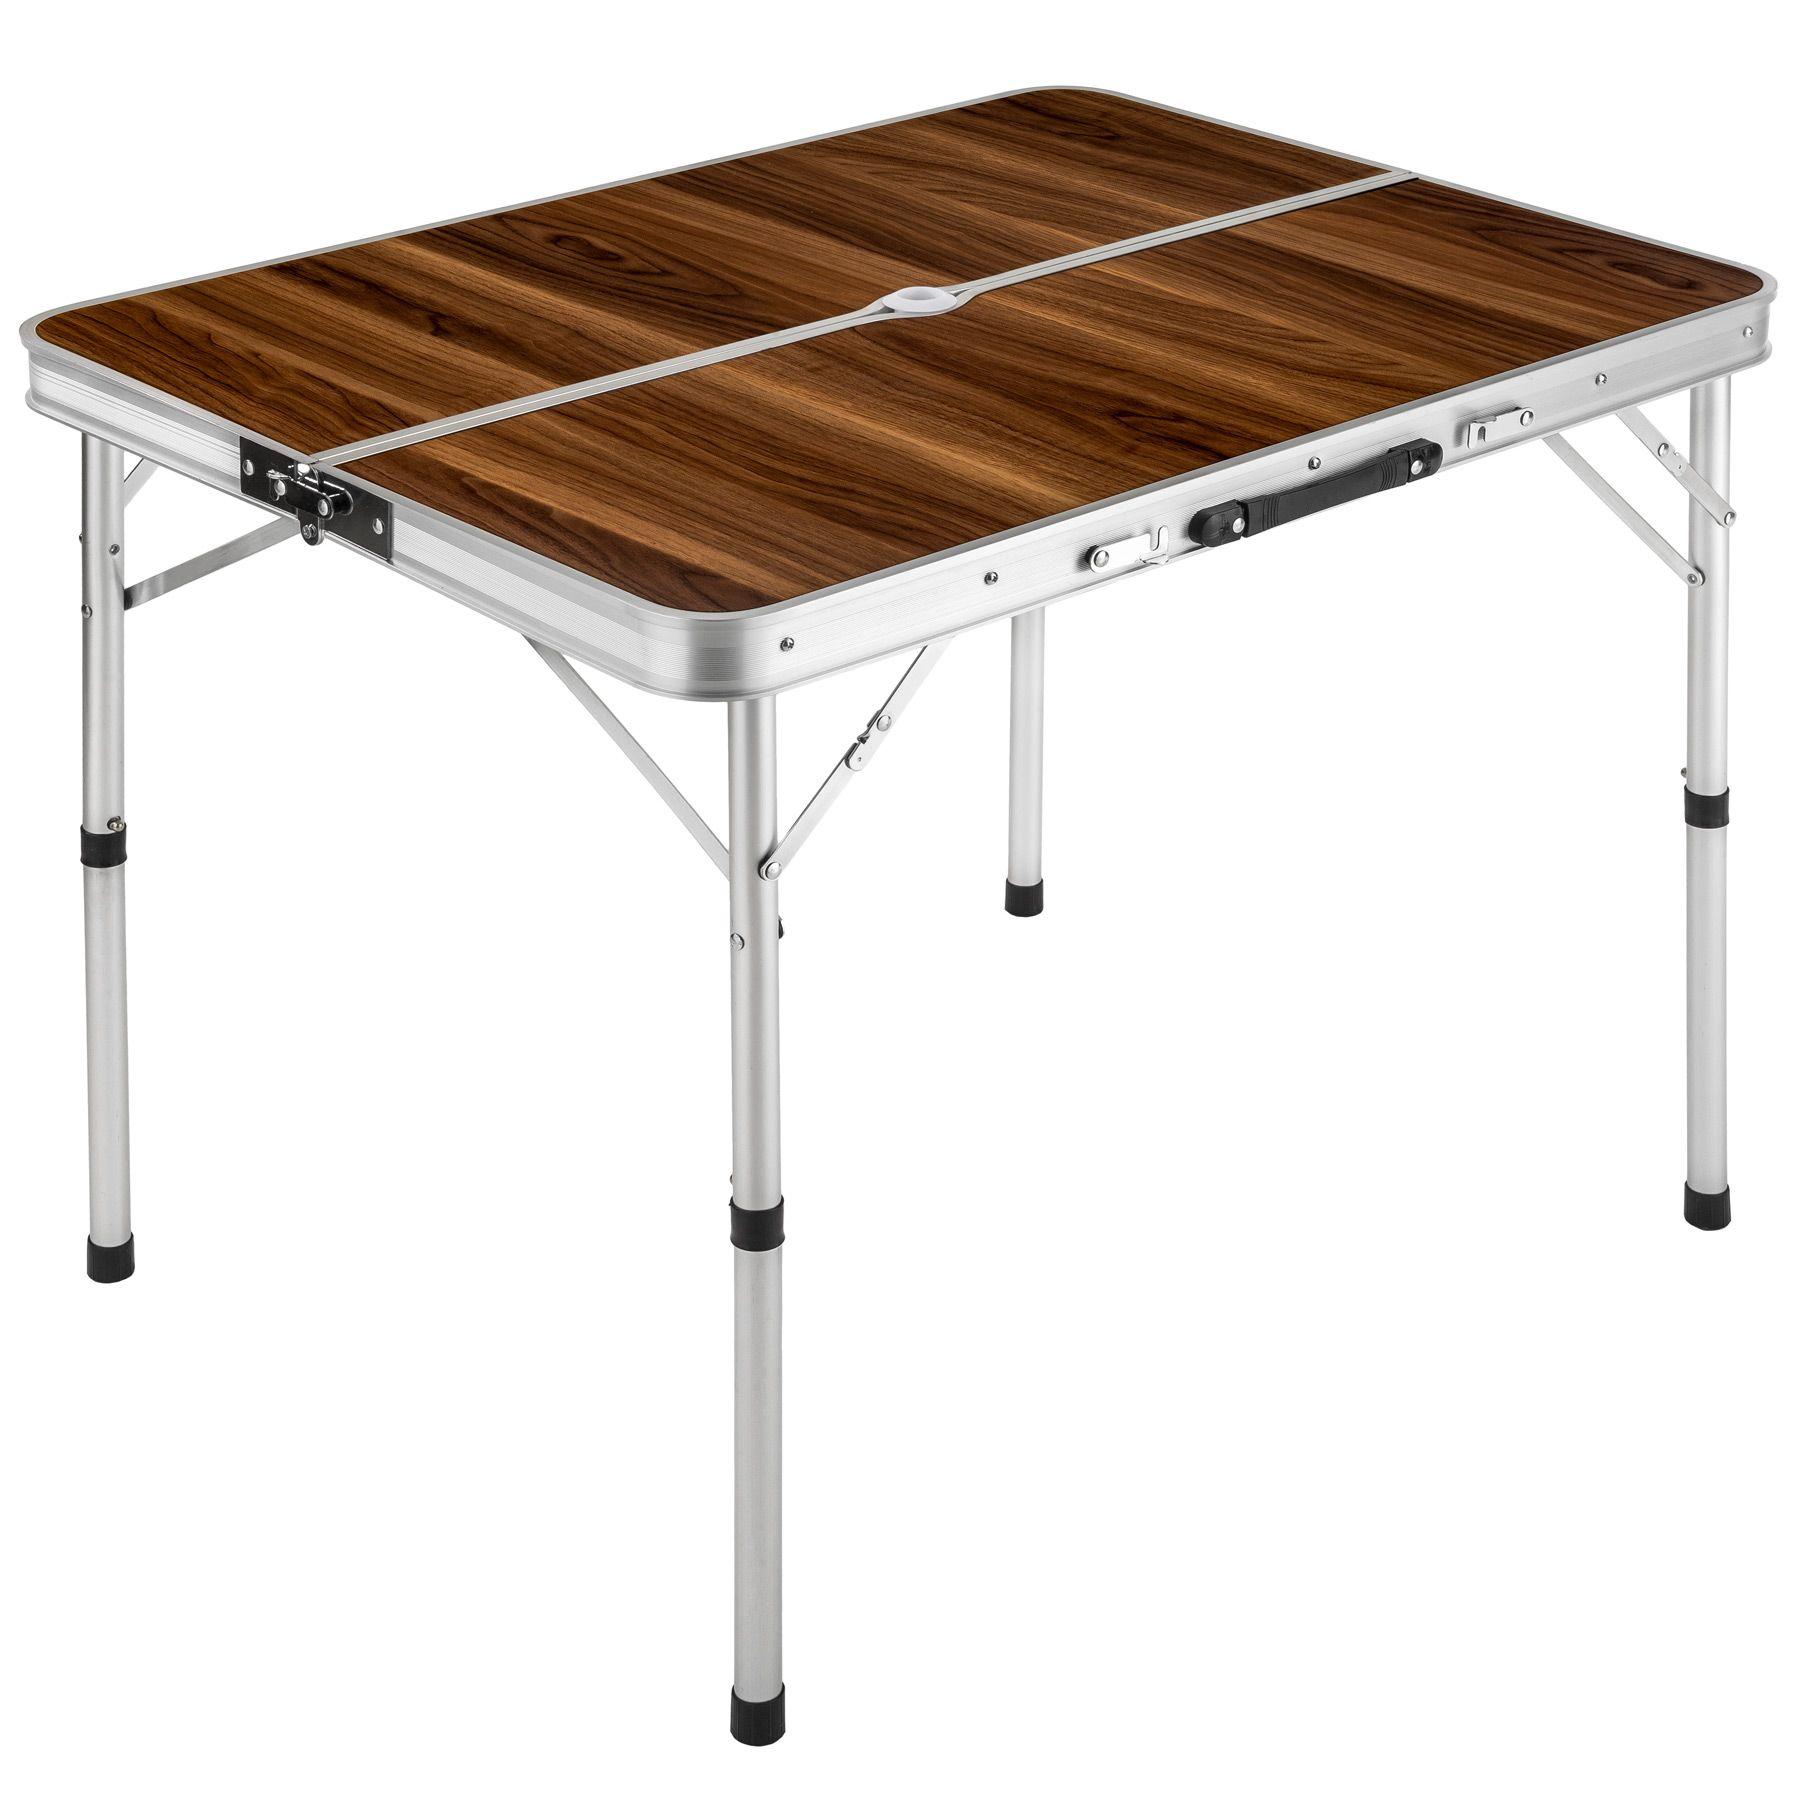 Eensemble table pliante valise avec 2 bancs camping aluminium pique ...